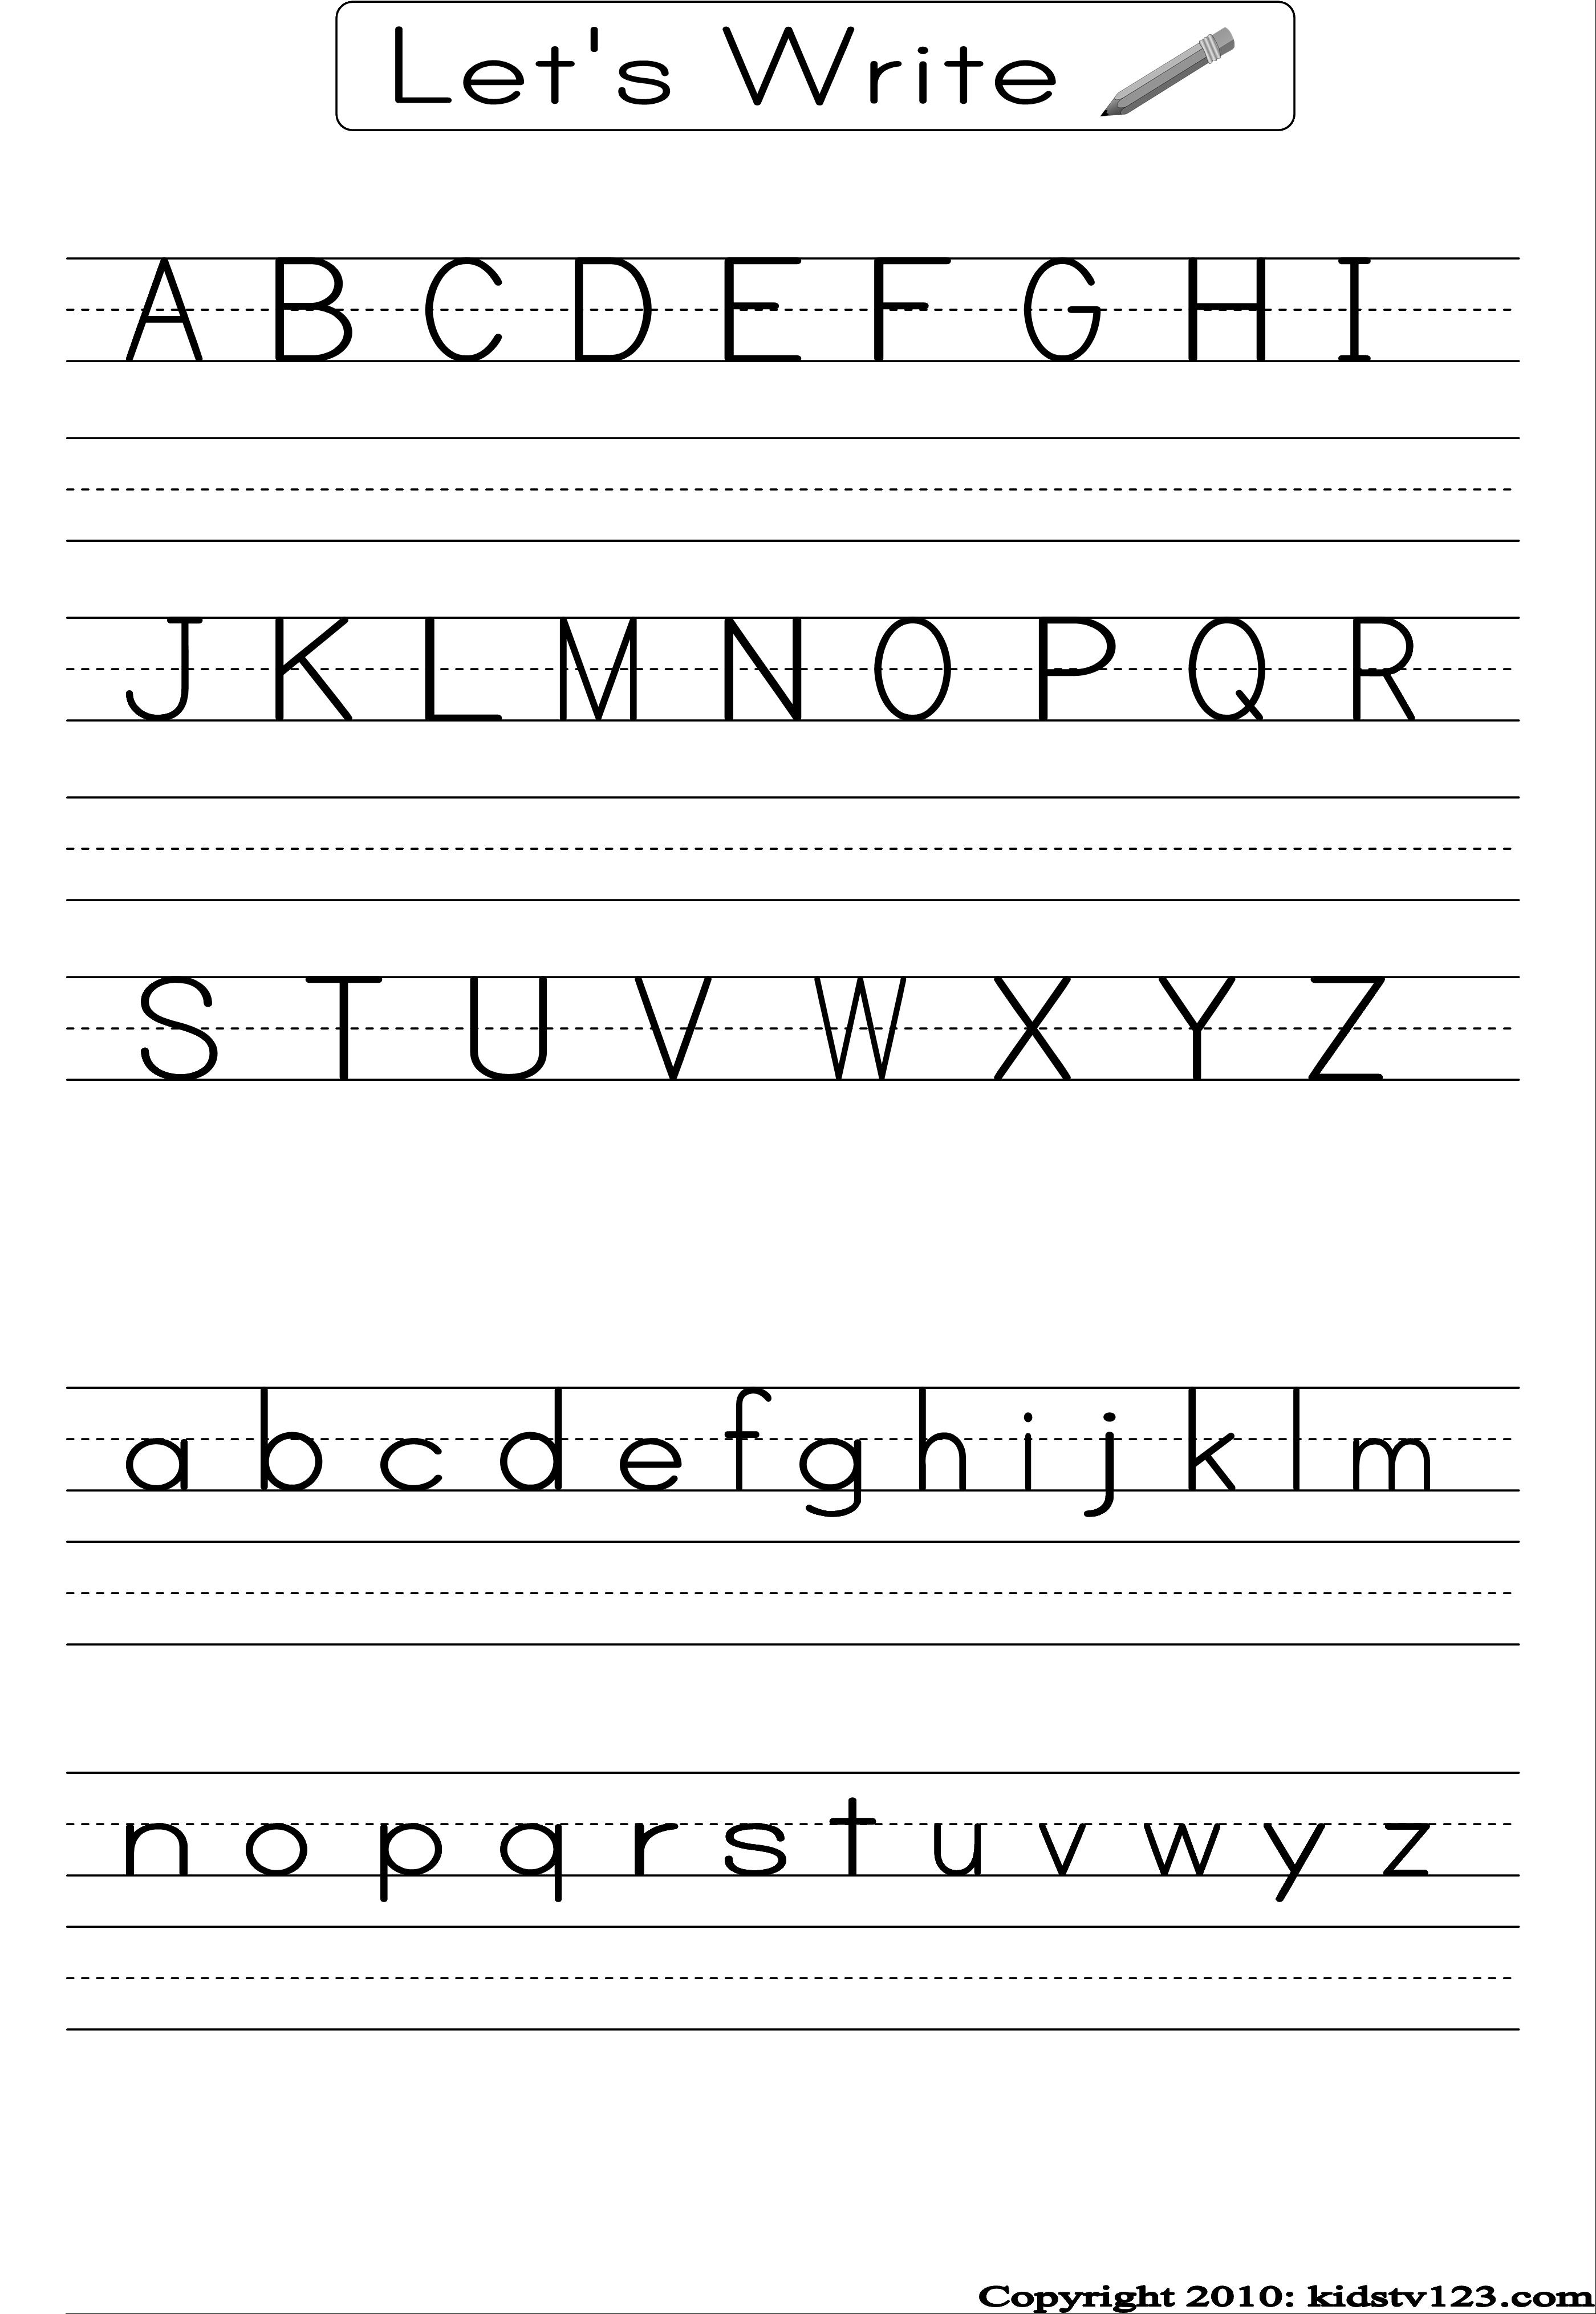 Alphabet Writing Practice Sheet | Edu-Fun | Alphabet Worksheets - Preschool Writing Worksheets Free Printable